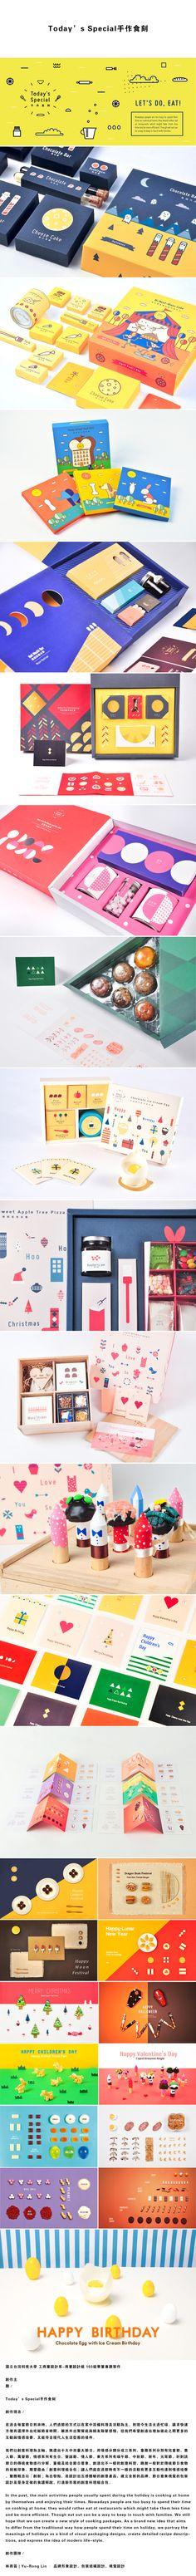 51 ideas for design box food identity branding Kids Packaging, Brand Packaging, Packaging Design, Web Design, Logo Design, Food Branding, Kids Branding, Identity Design, Brand Identity